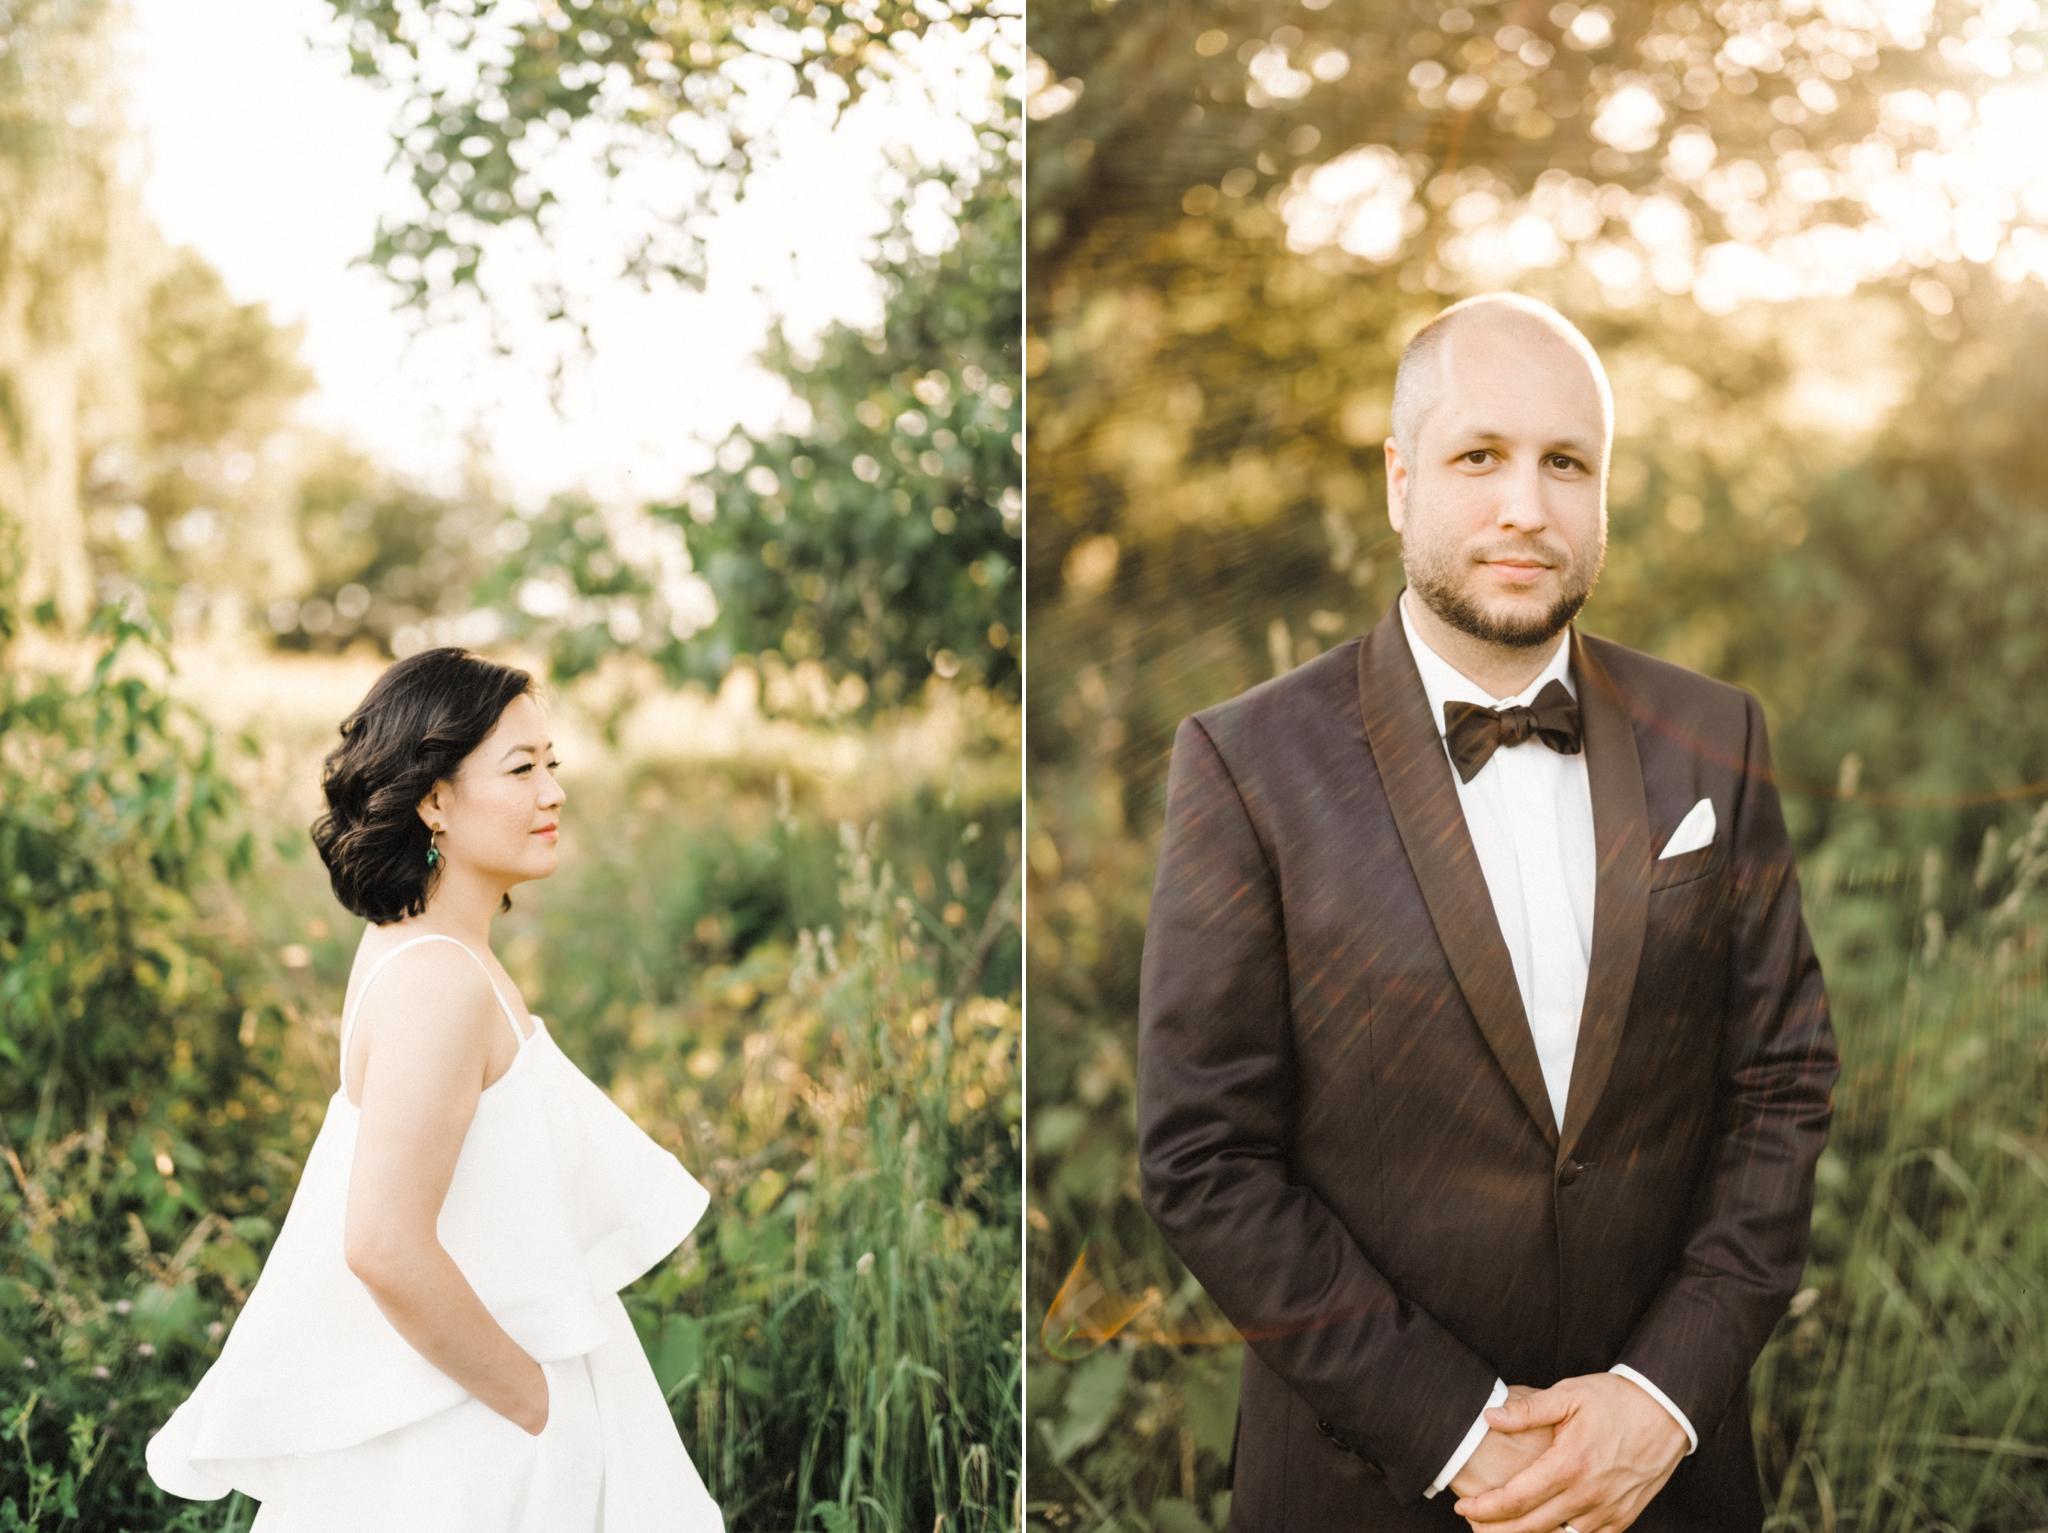 Illinois_backyard_wedding_0017.jpg